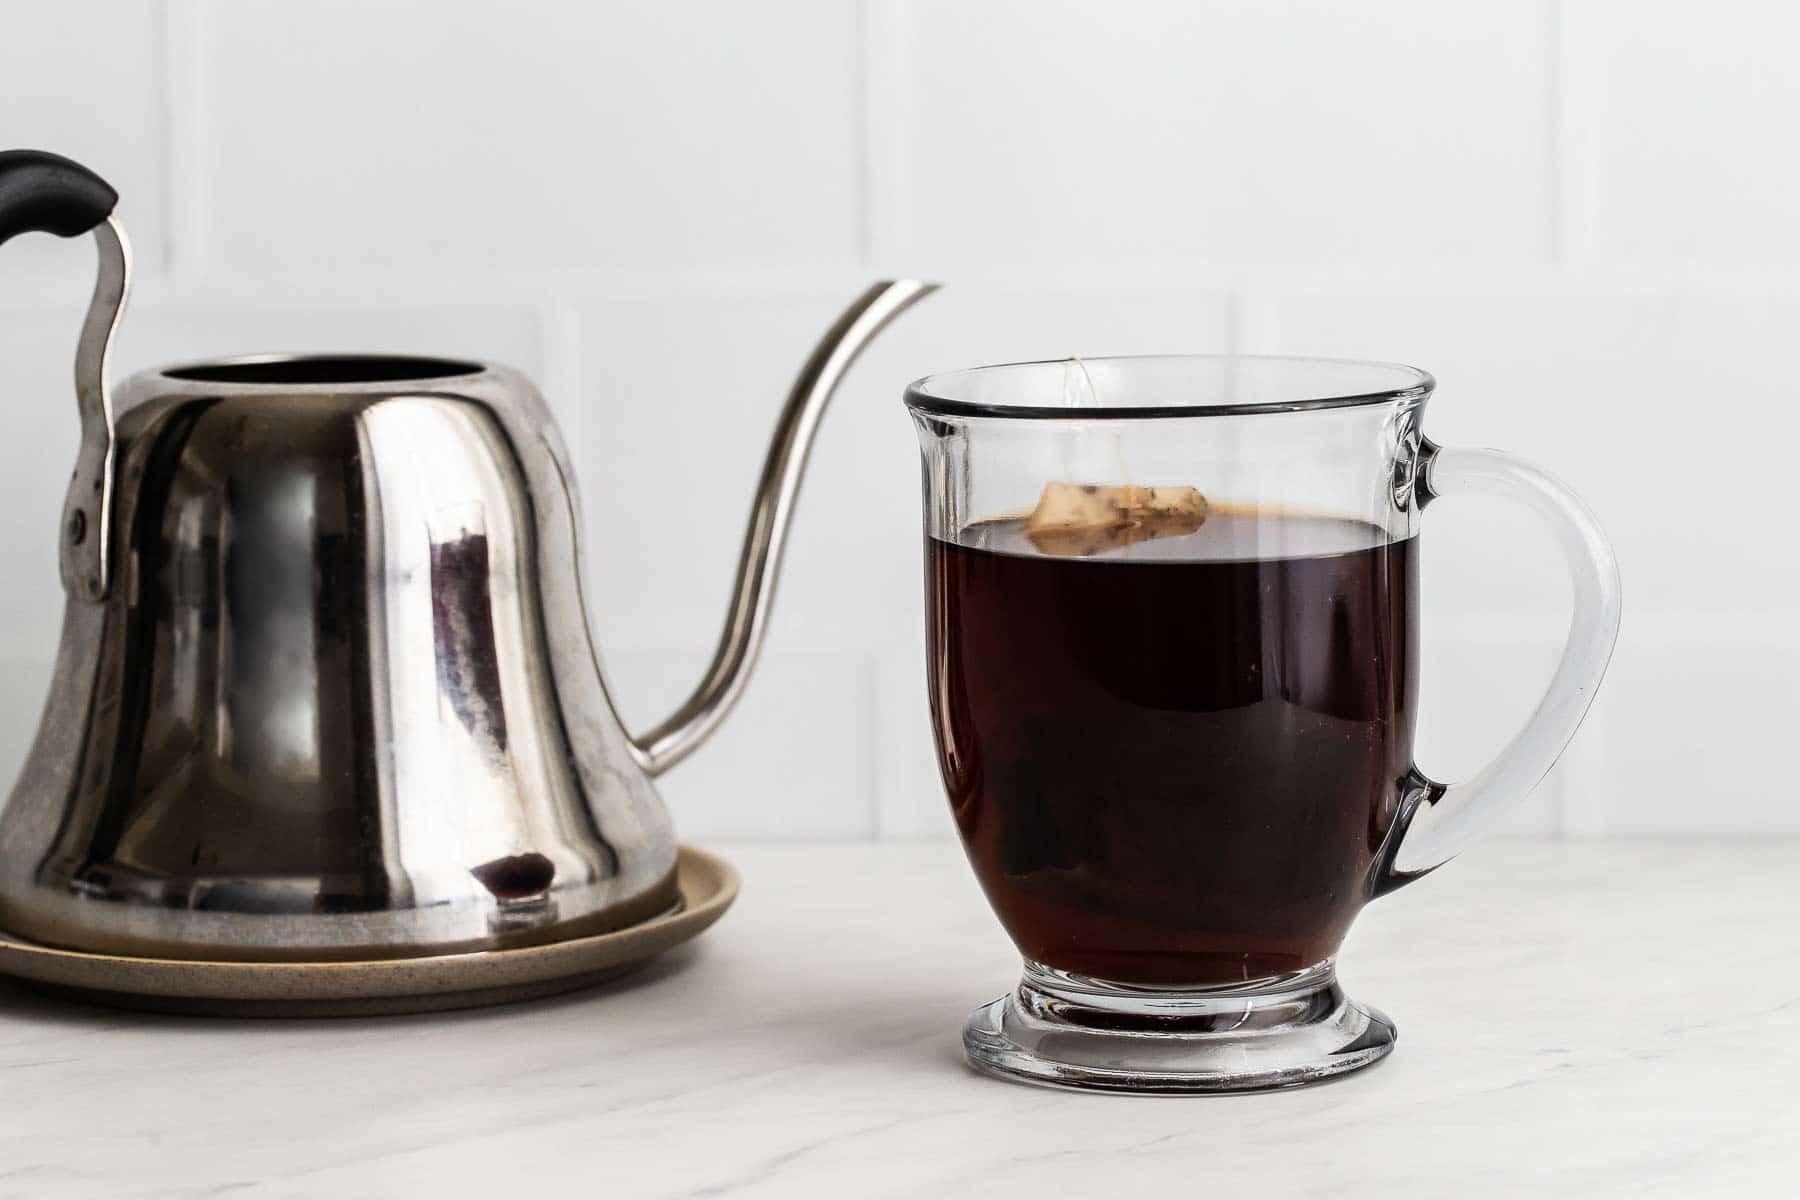 Earl Grey tea steeping in clear glass mug.